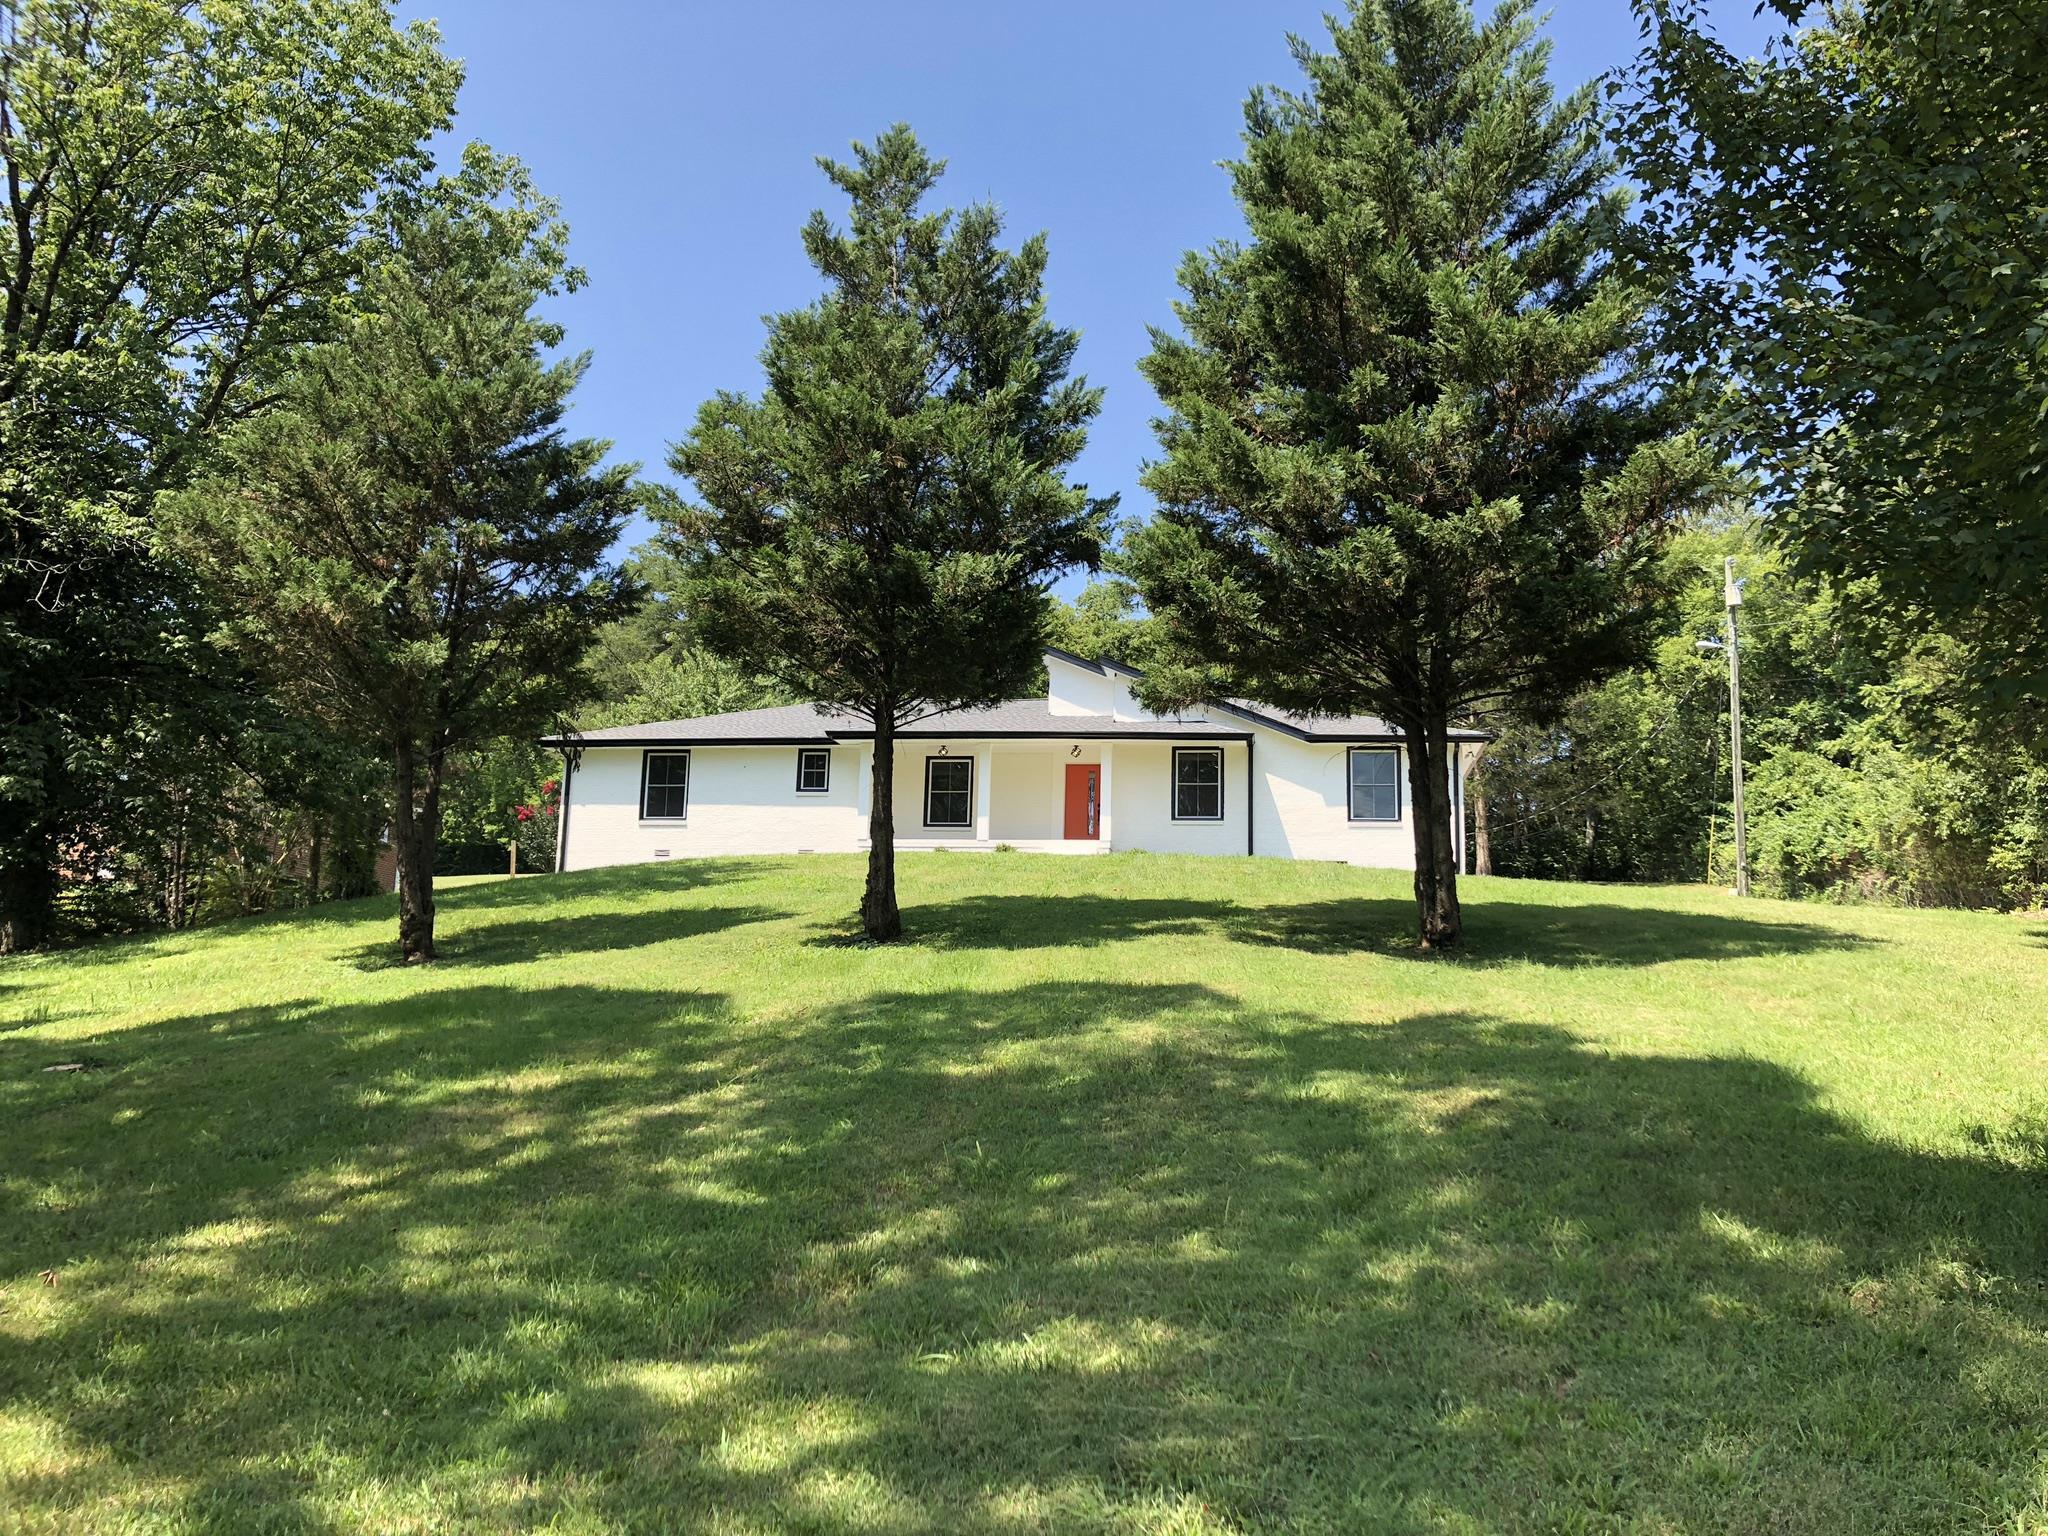 4227 W Hamilton Rd, Nashville, TN 37218 - Nashville, TN real estate listing